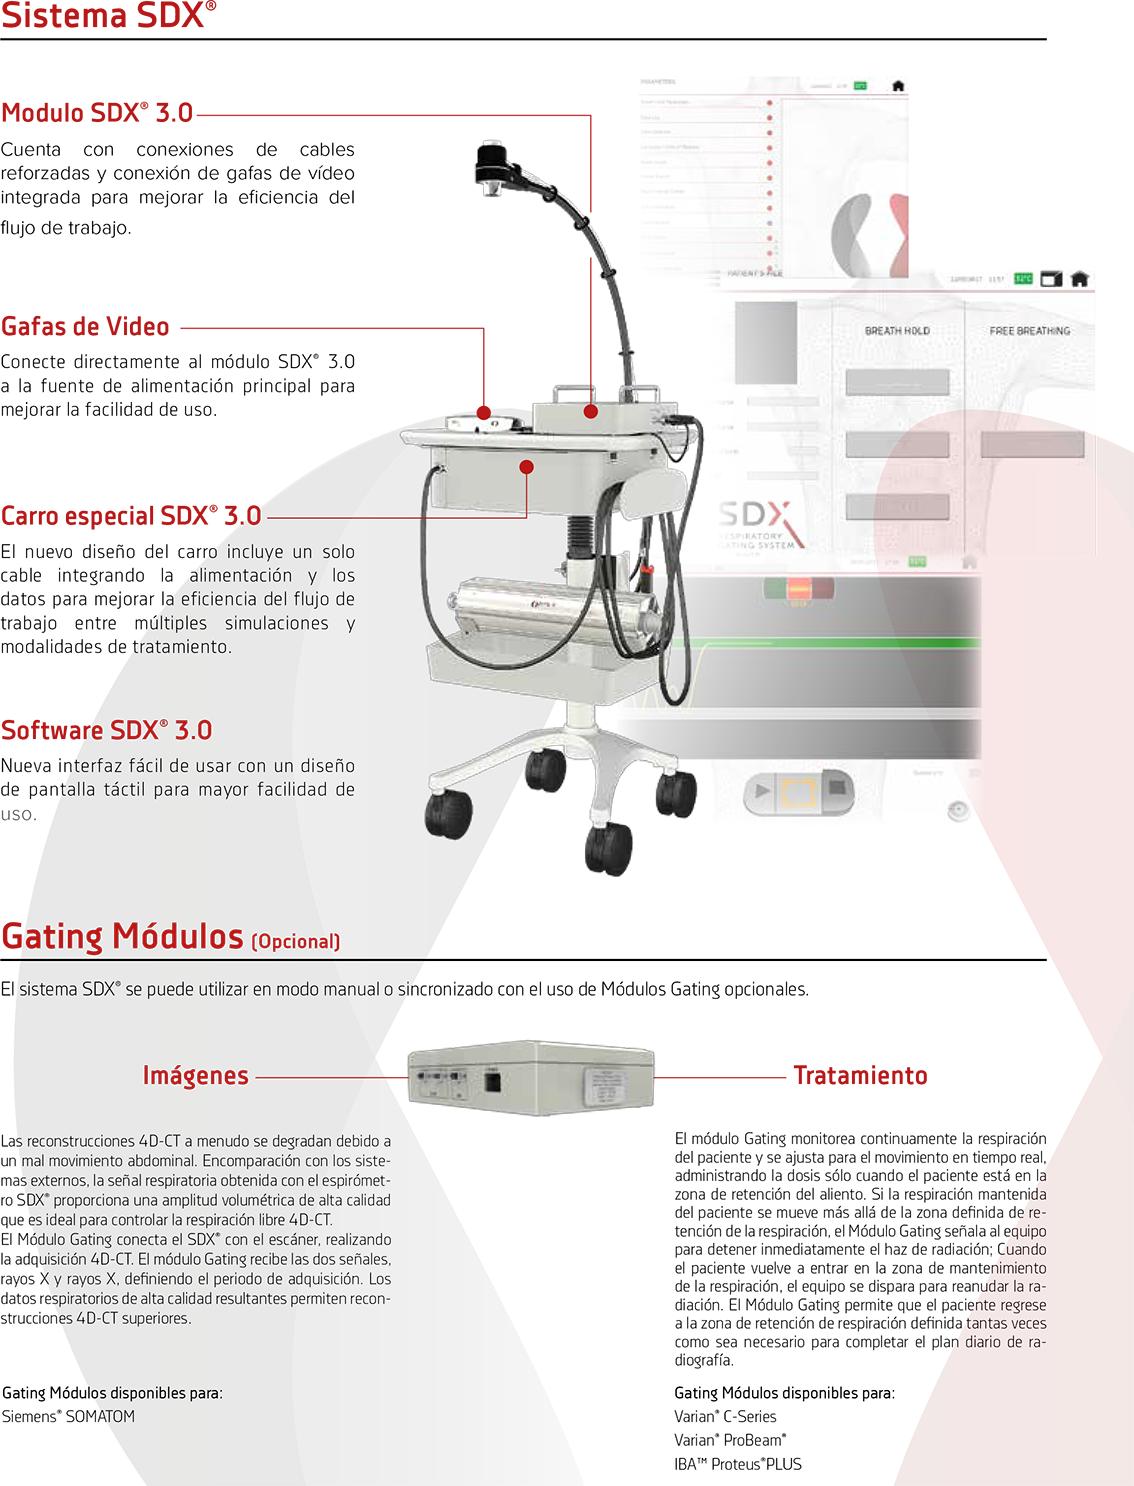 sistema-SDX-detalles-surgest-medical